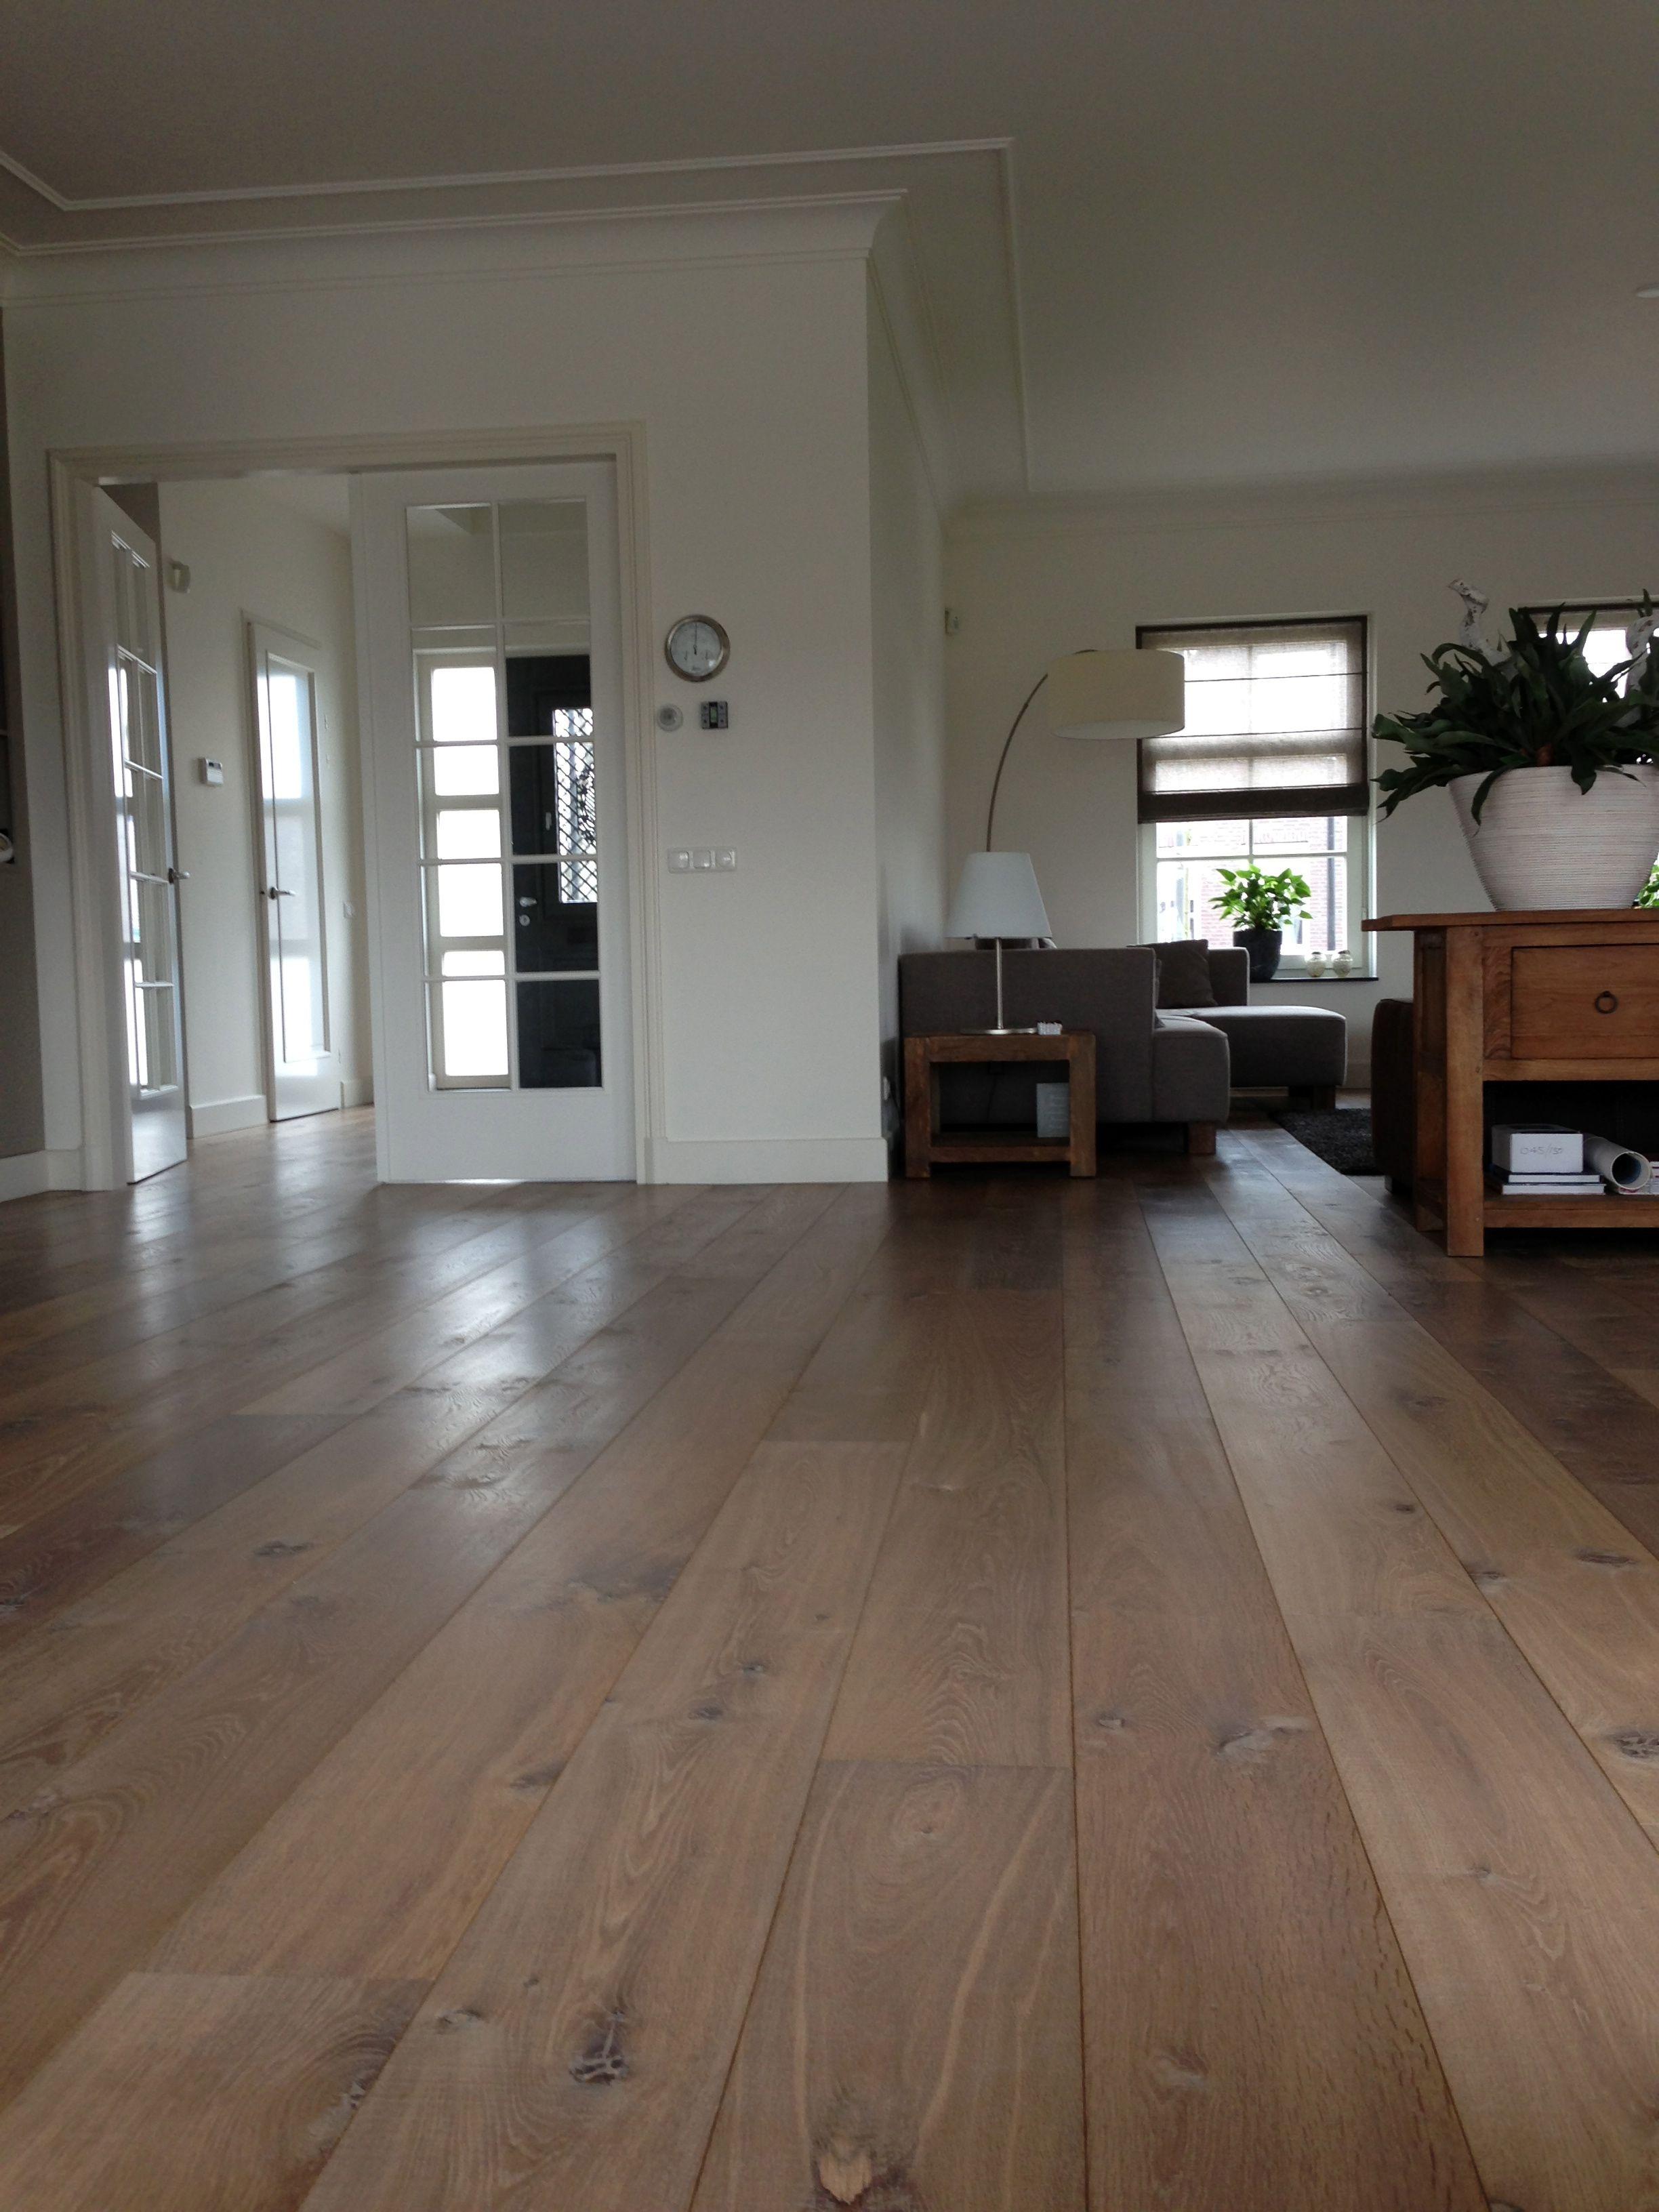 Met, Kick plate and Flooring on Pinterest